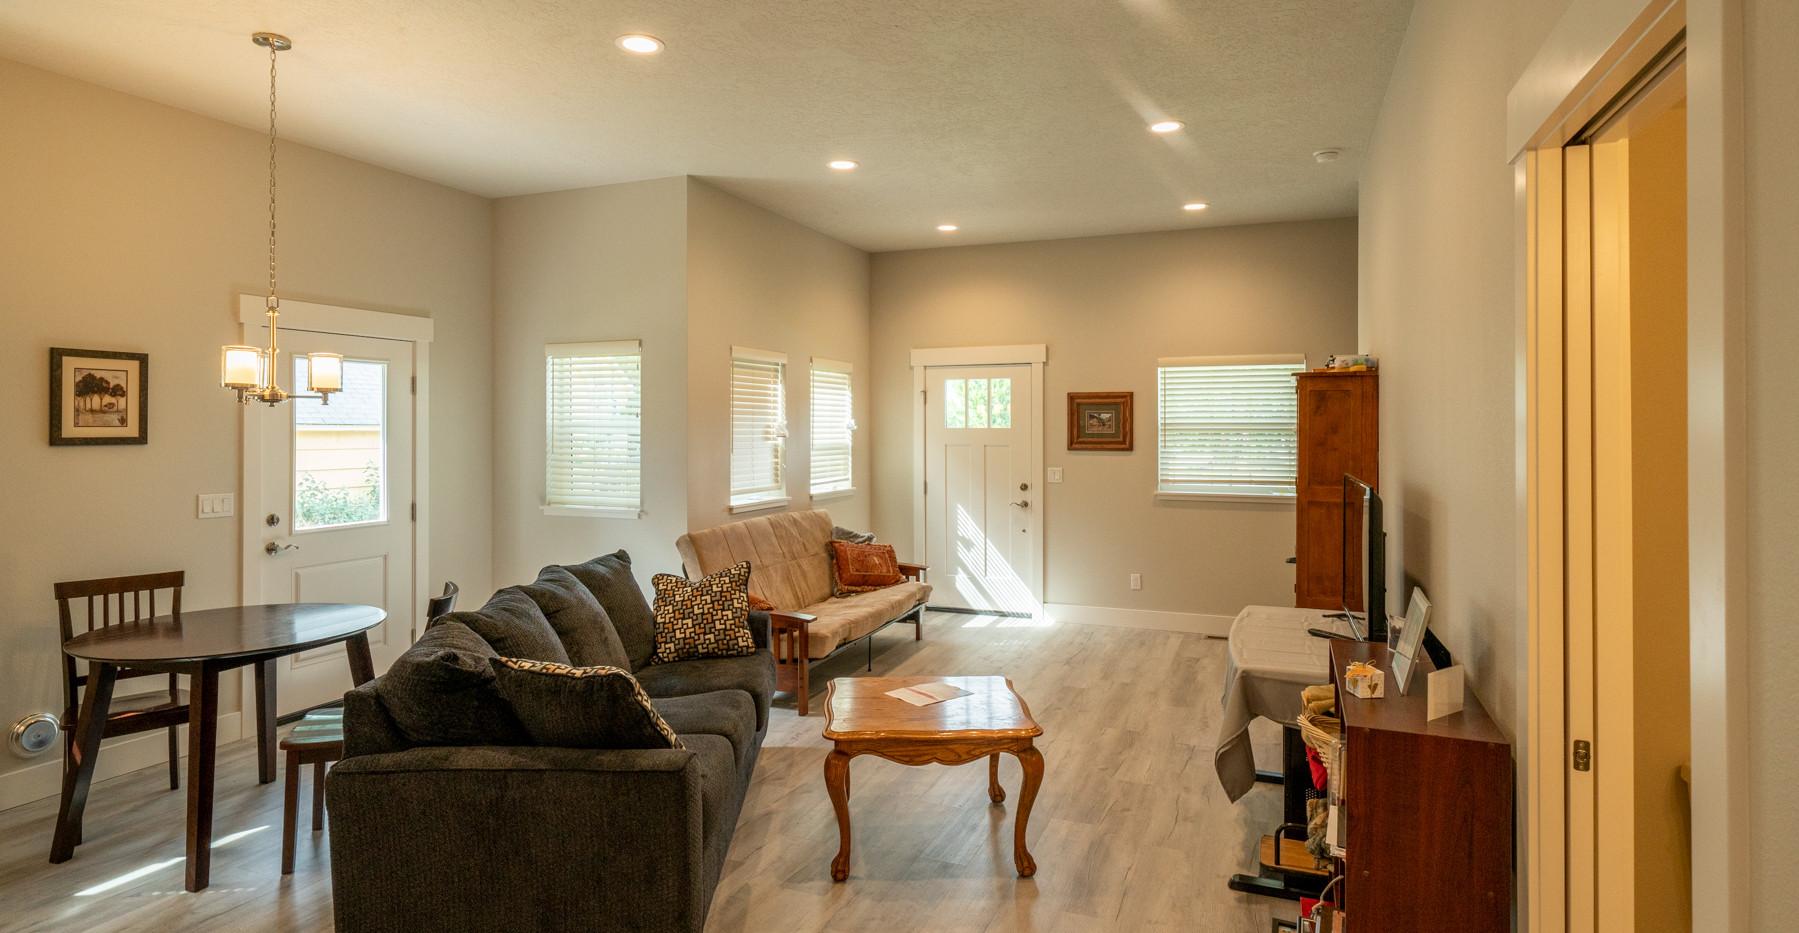 Multifamily Housing Interior 2